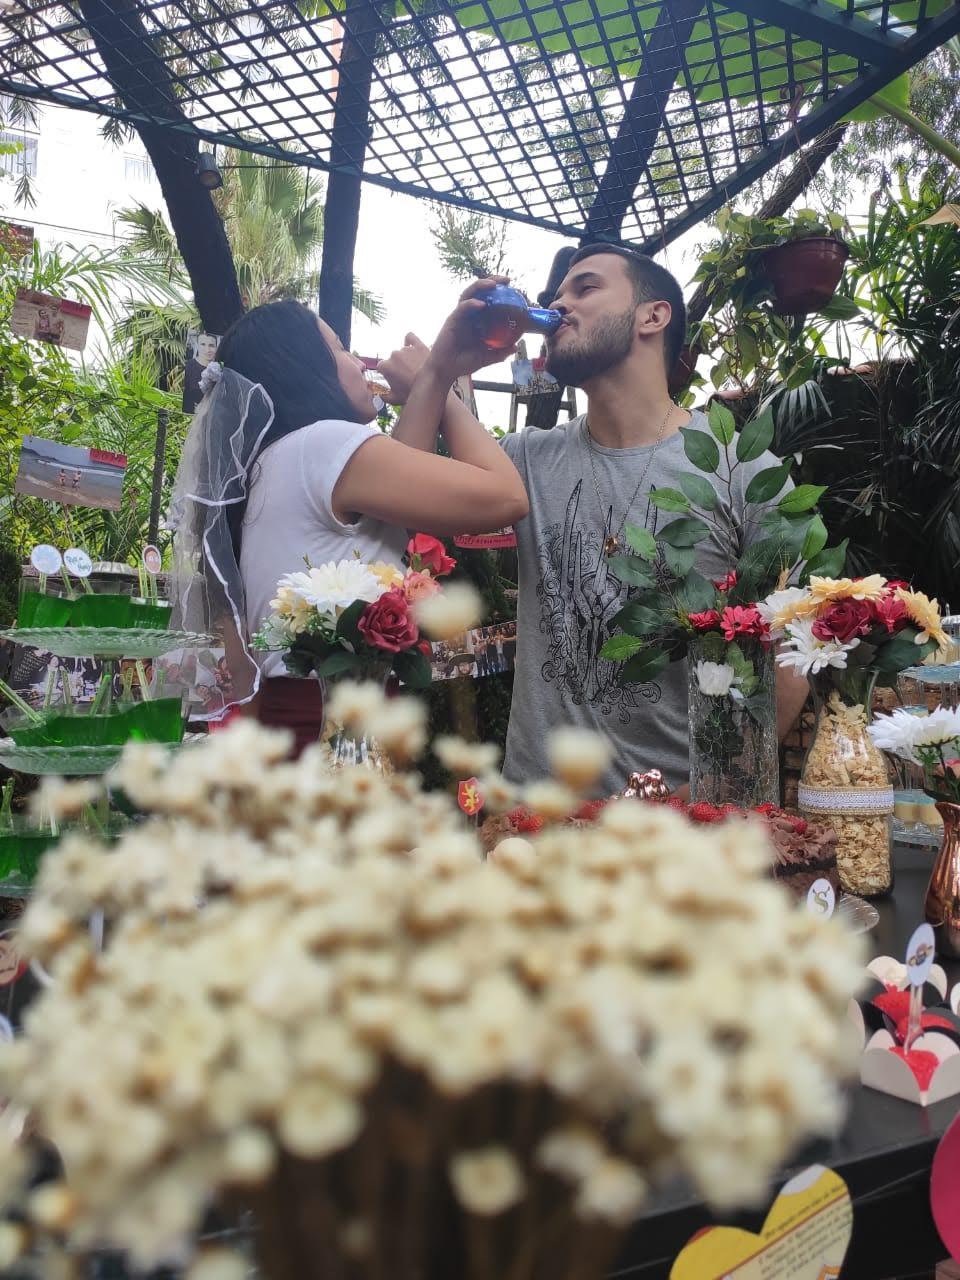 Festa de Noivado Temática Nerd